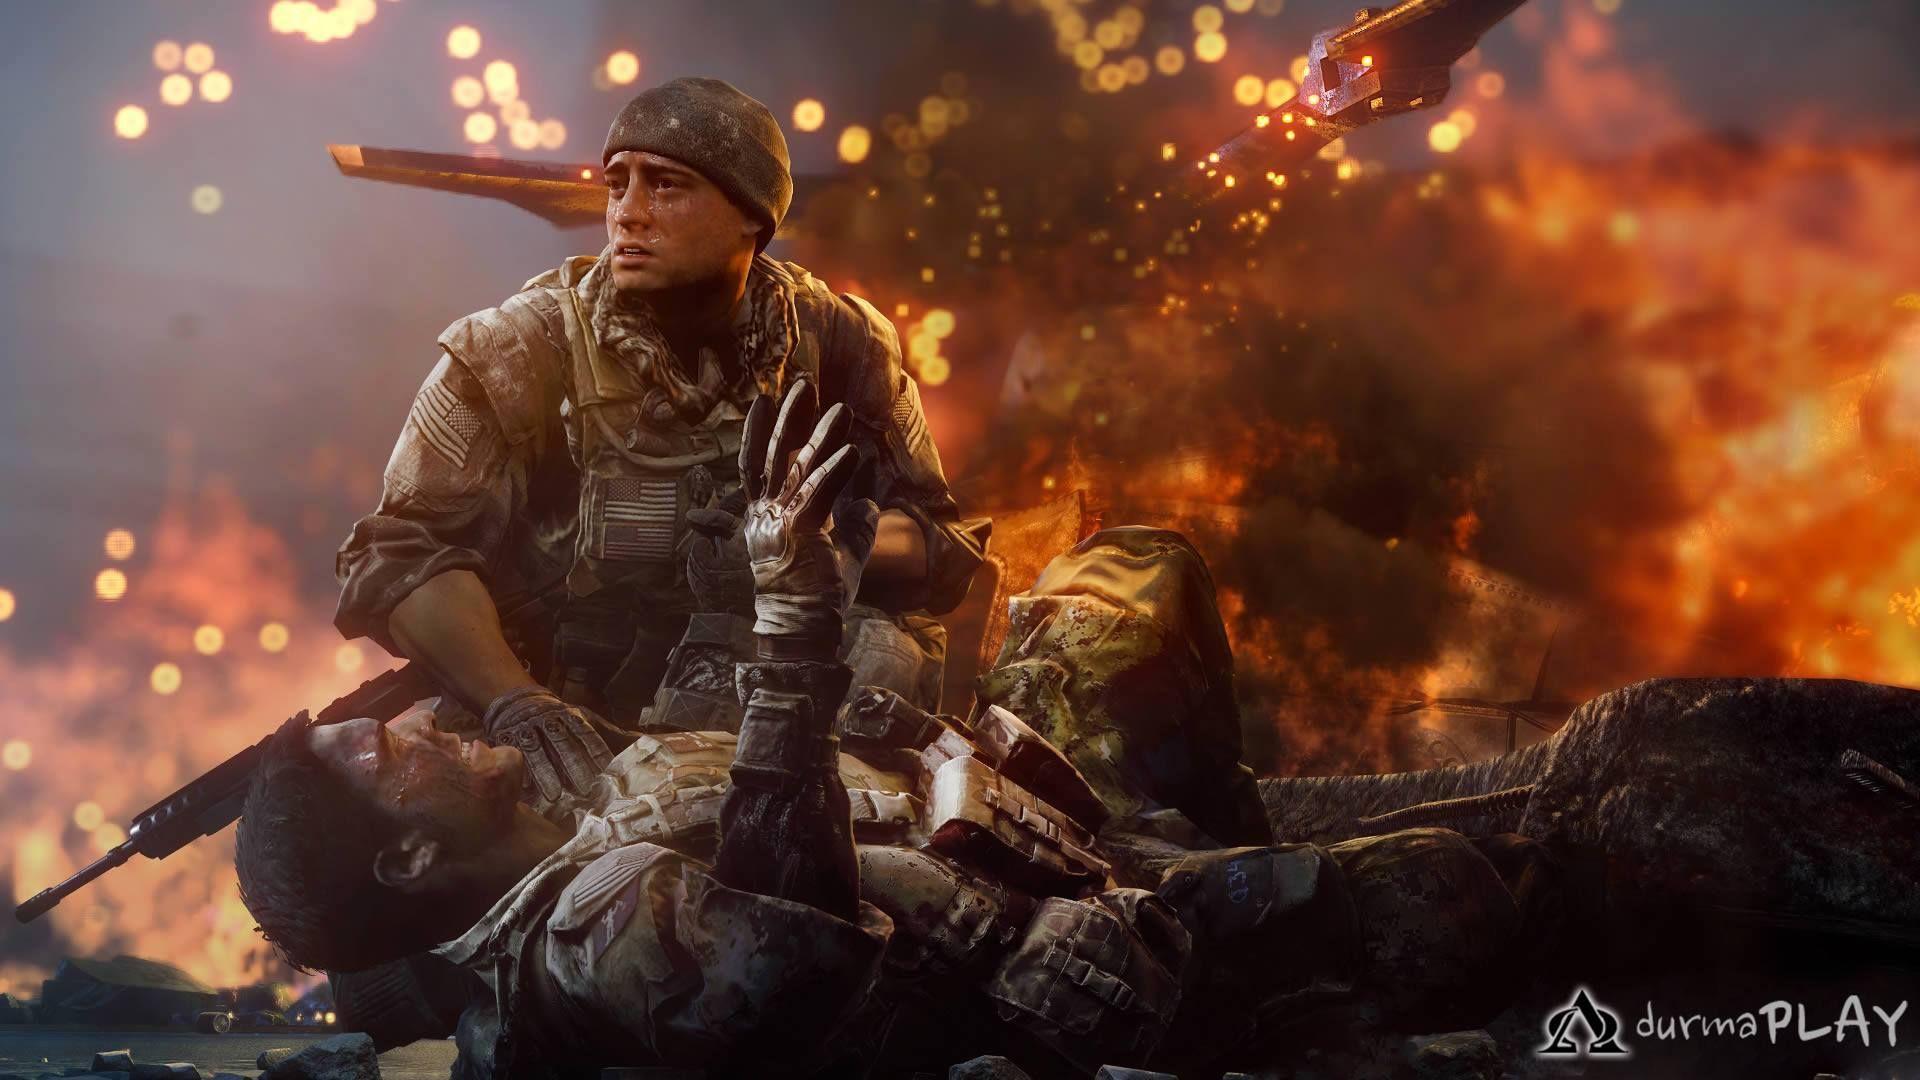 https://www.durmaplay.com/Product/battlefield-4-ps4-icin battlefield-4-bf4-ps4-screenshot-durmaplay-oyun-01469901.jpg 1.920×1.080 piksel